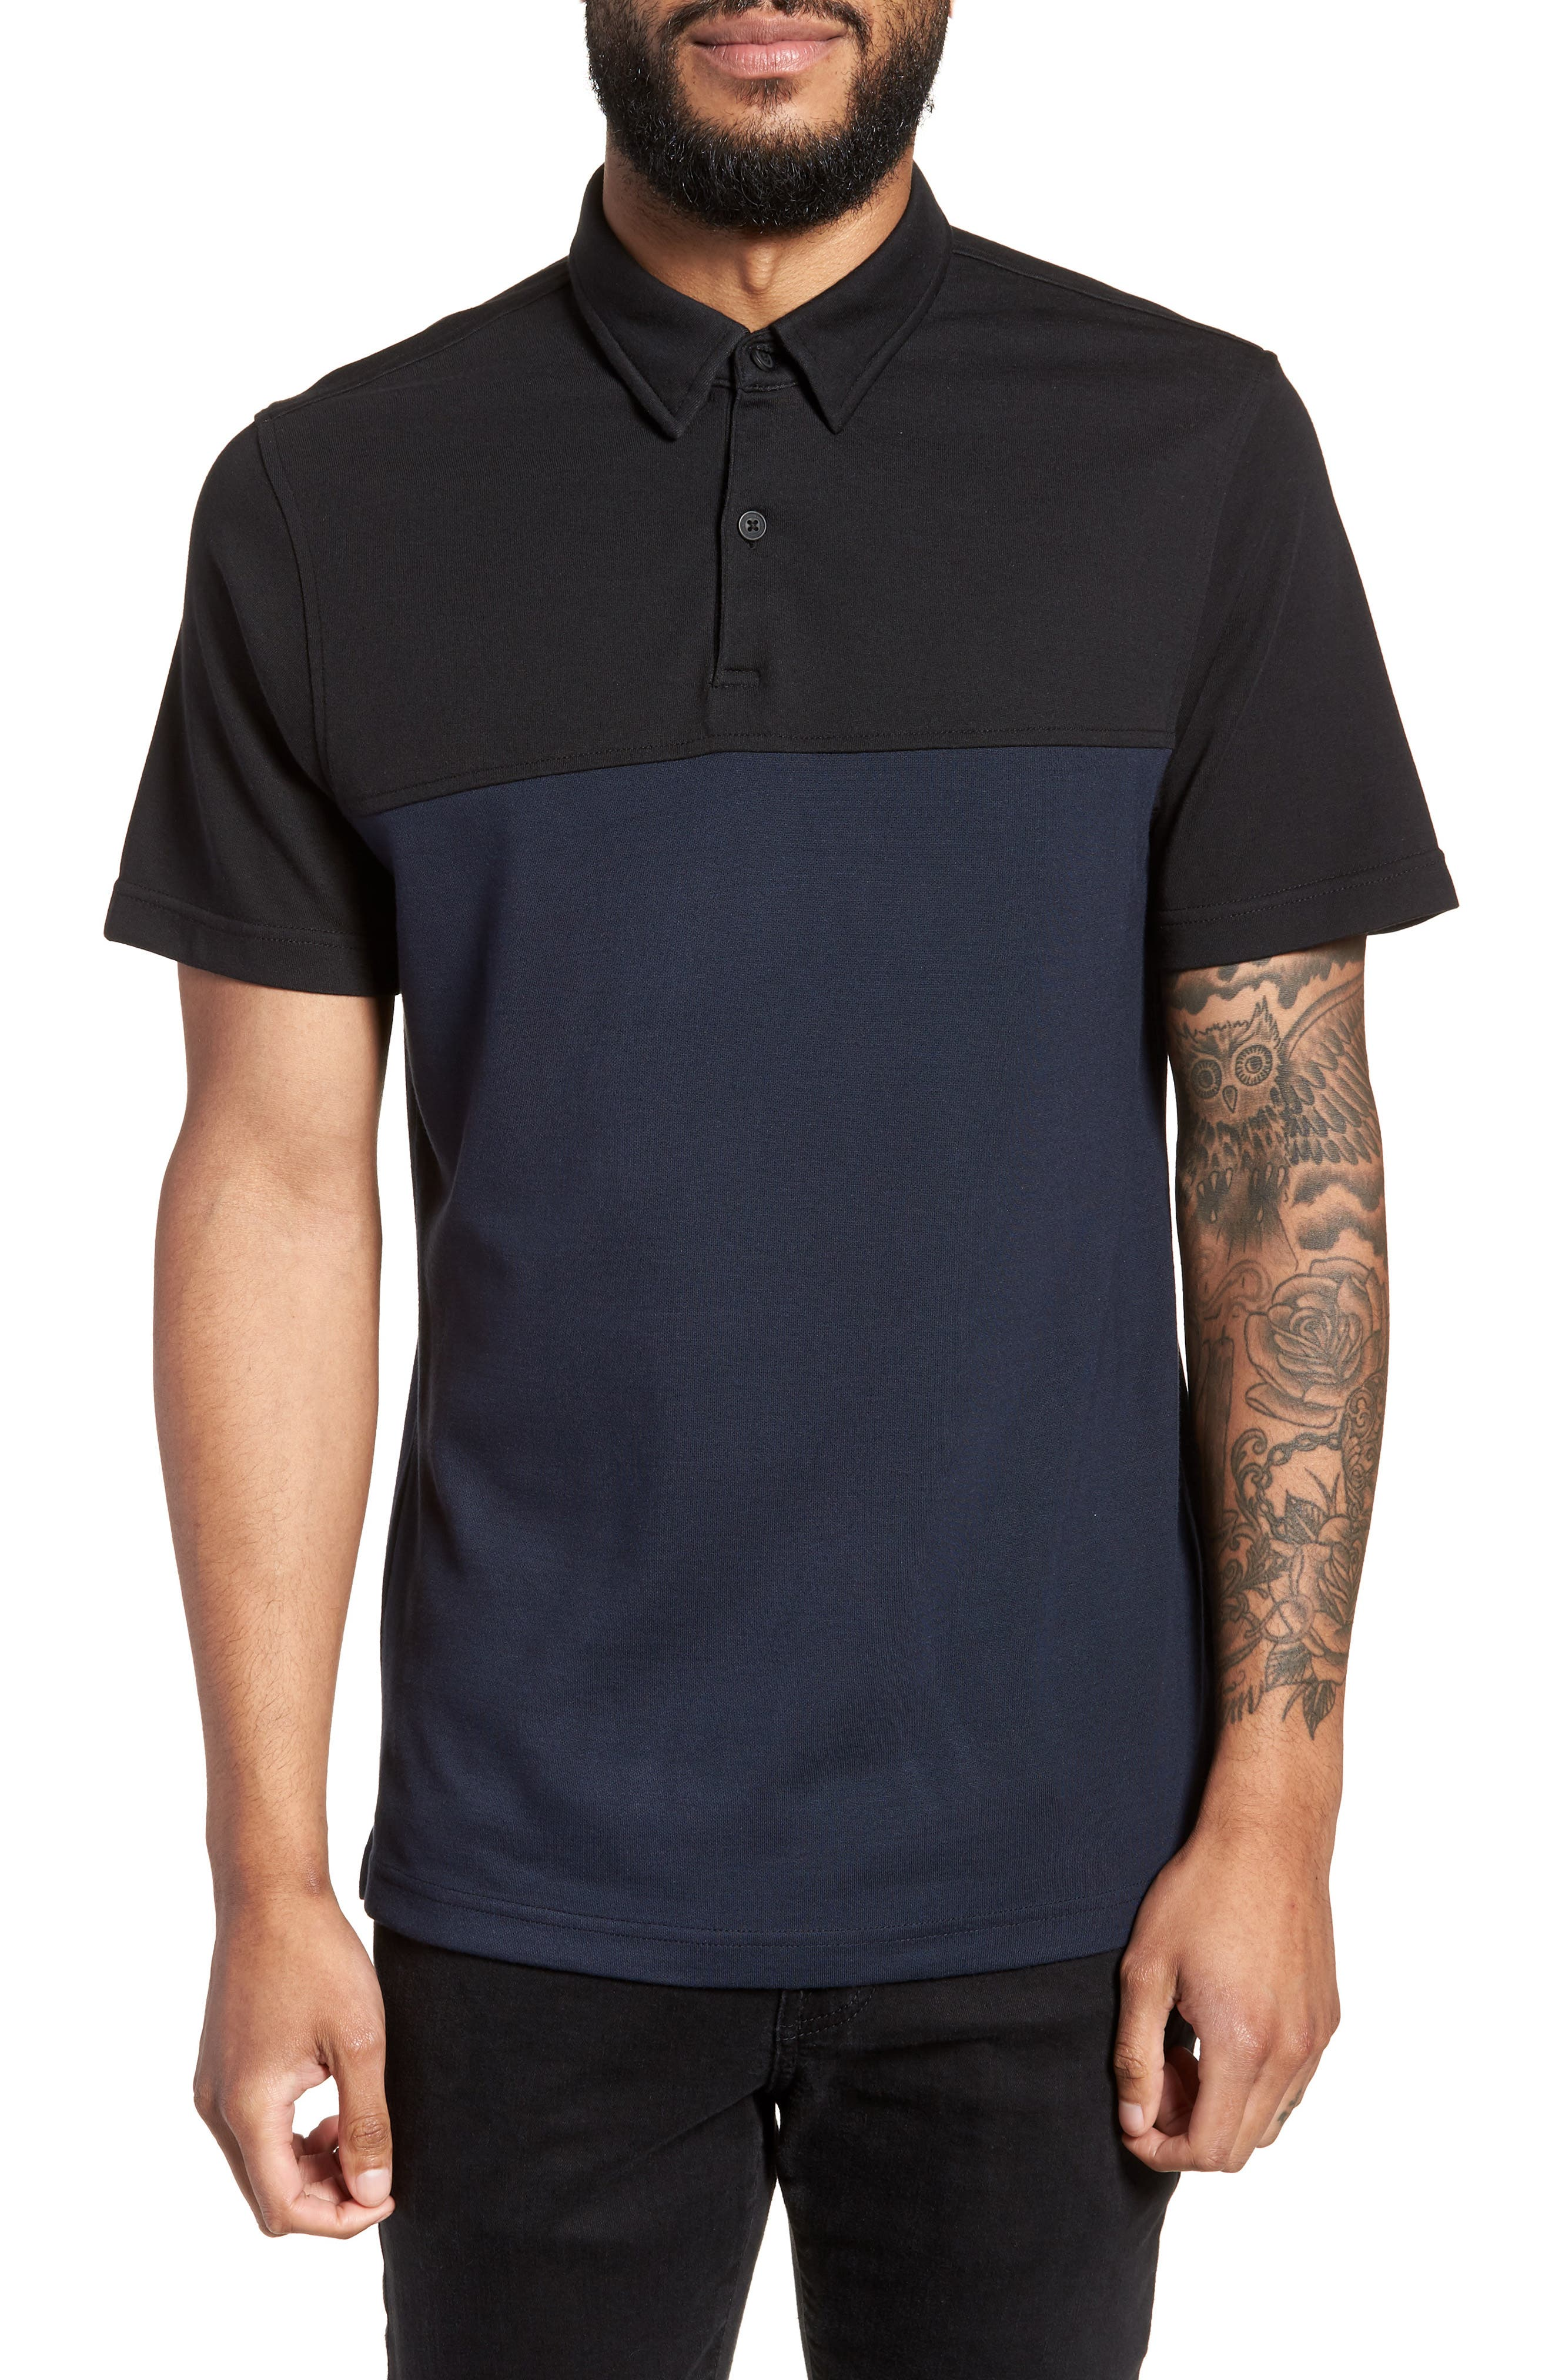 TWENTYMETRICTONS Trim Fit Colorblock Short Sleeve Polo